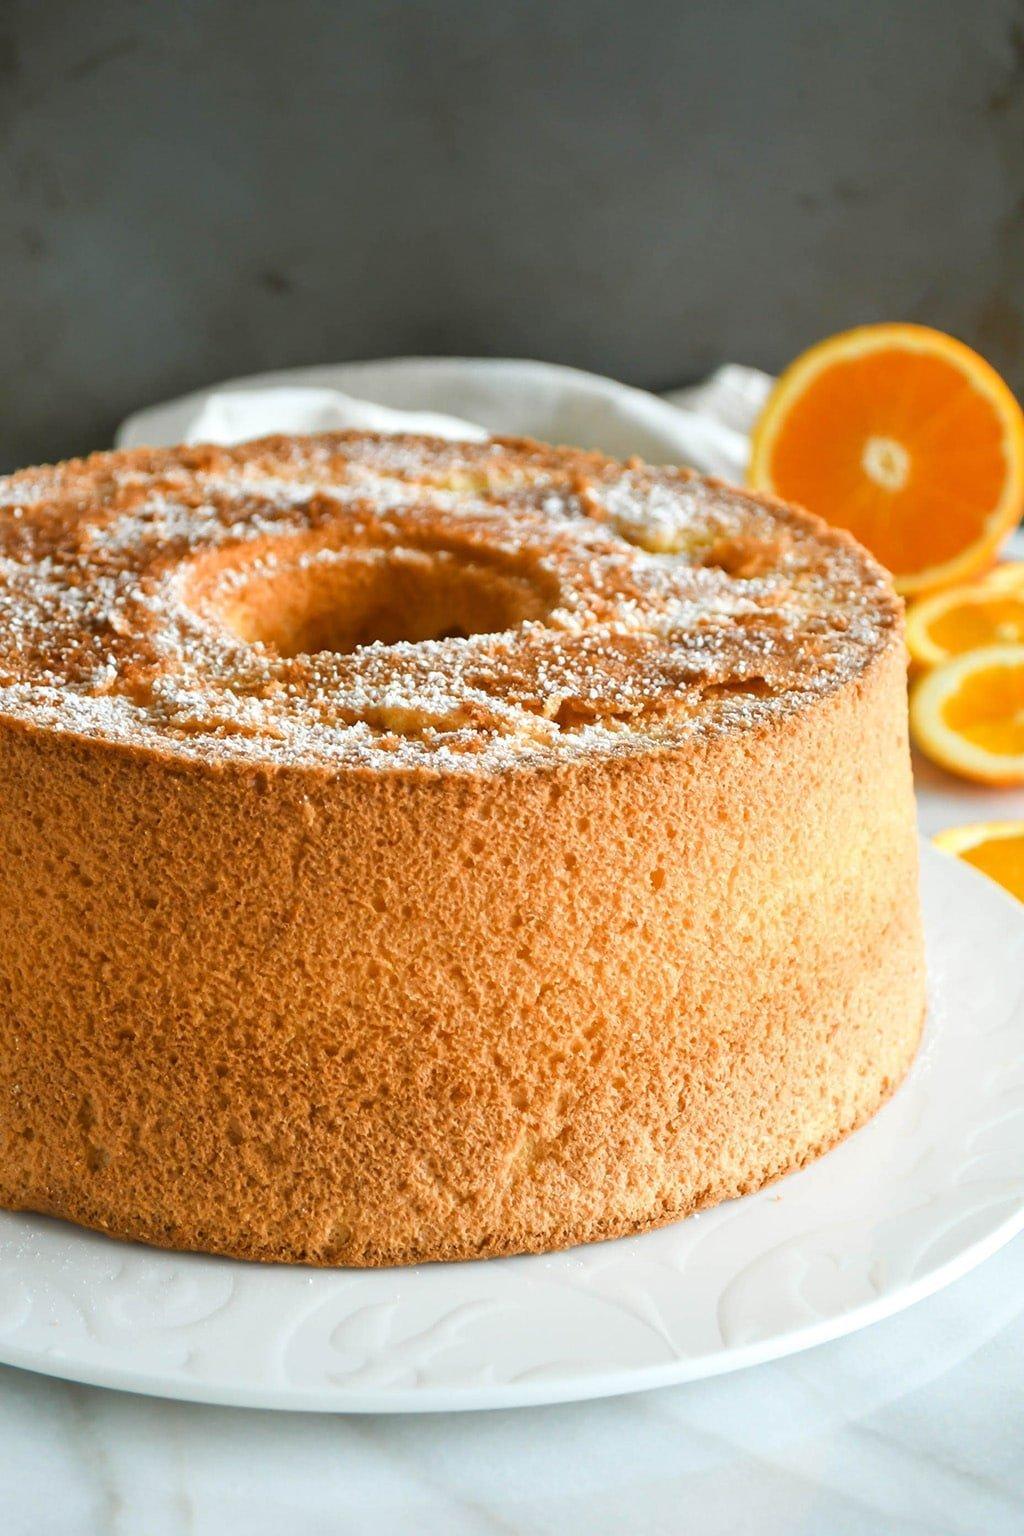 Orange chiffon cake whole, on a serving plate